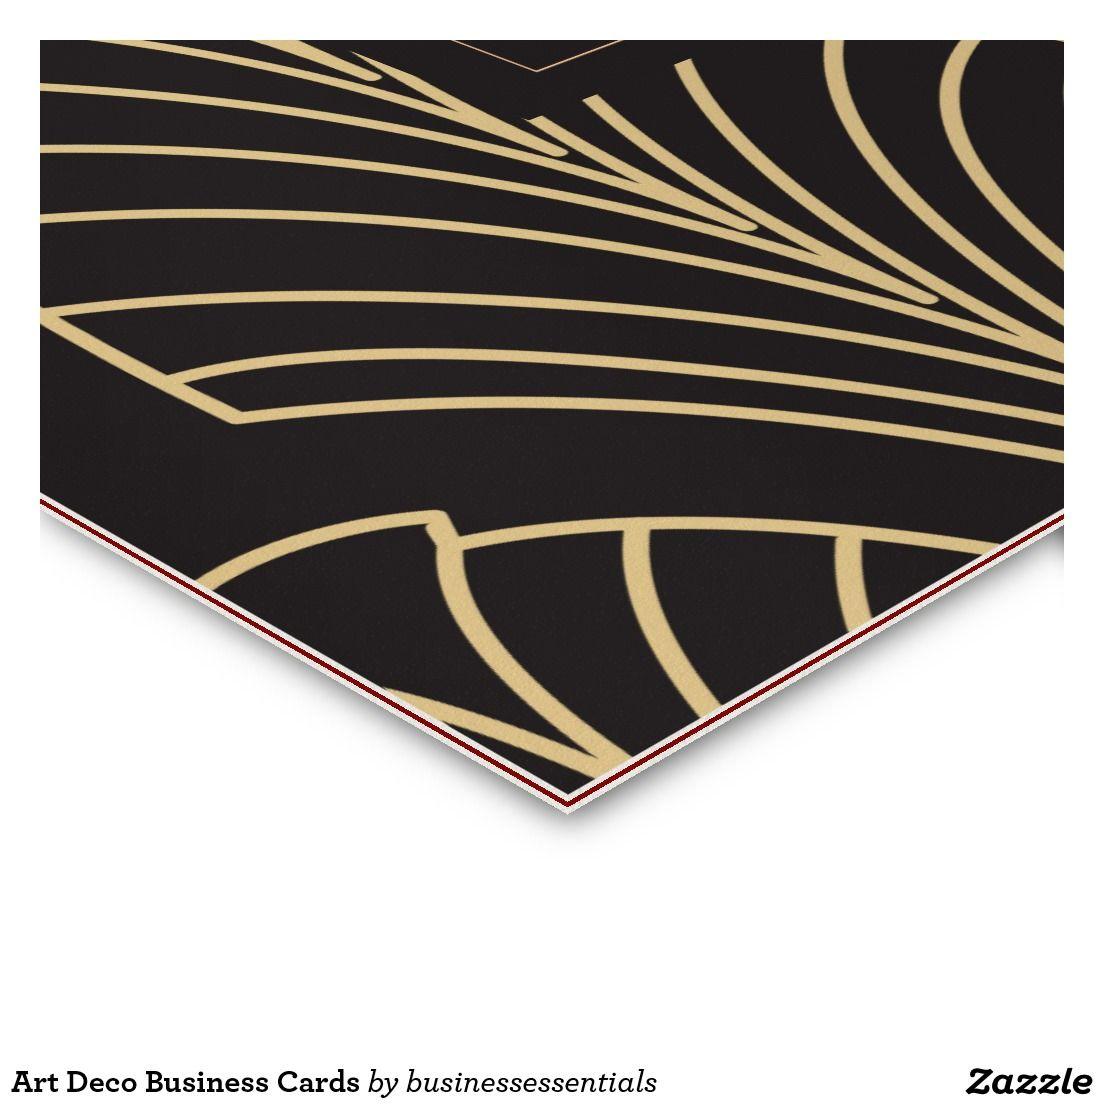 Art Deco Business Cards | BusinessCardChic | Pinterest | Business cards